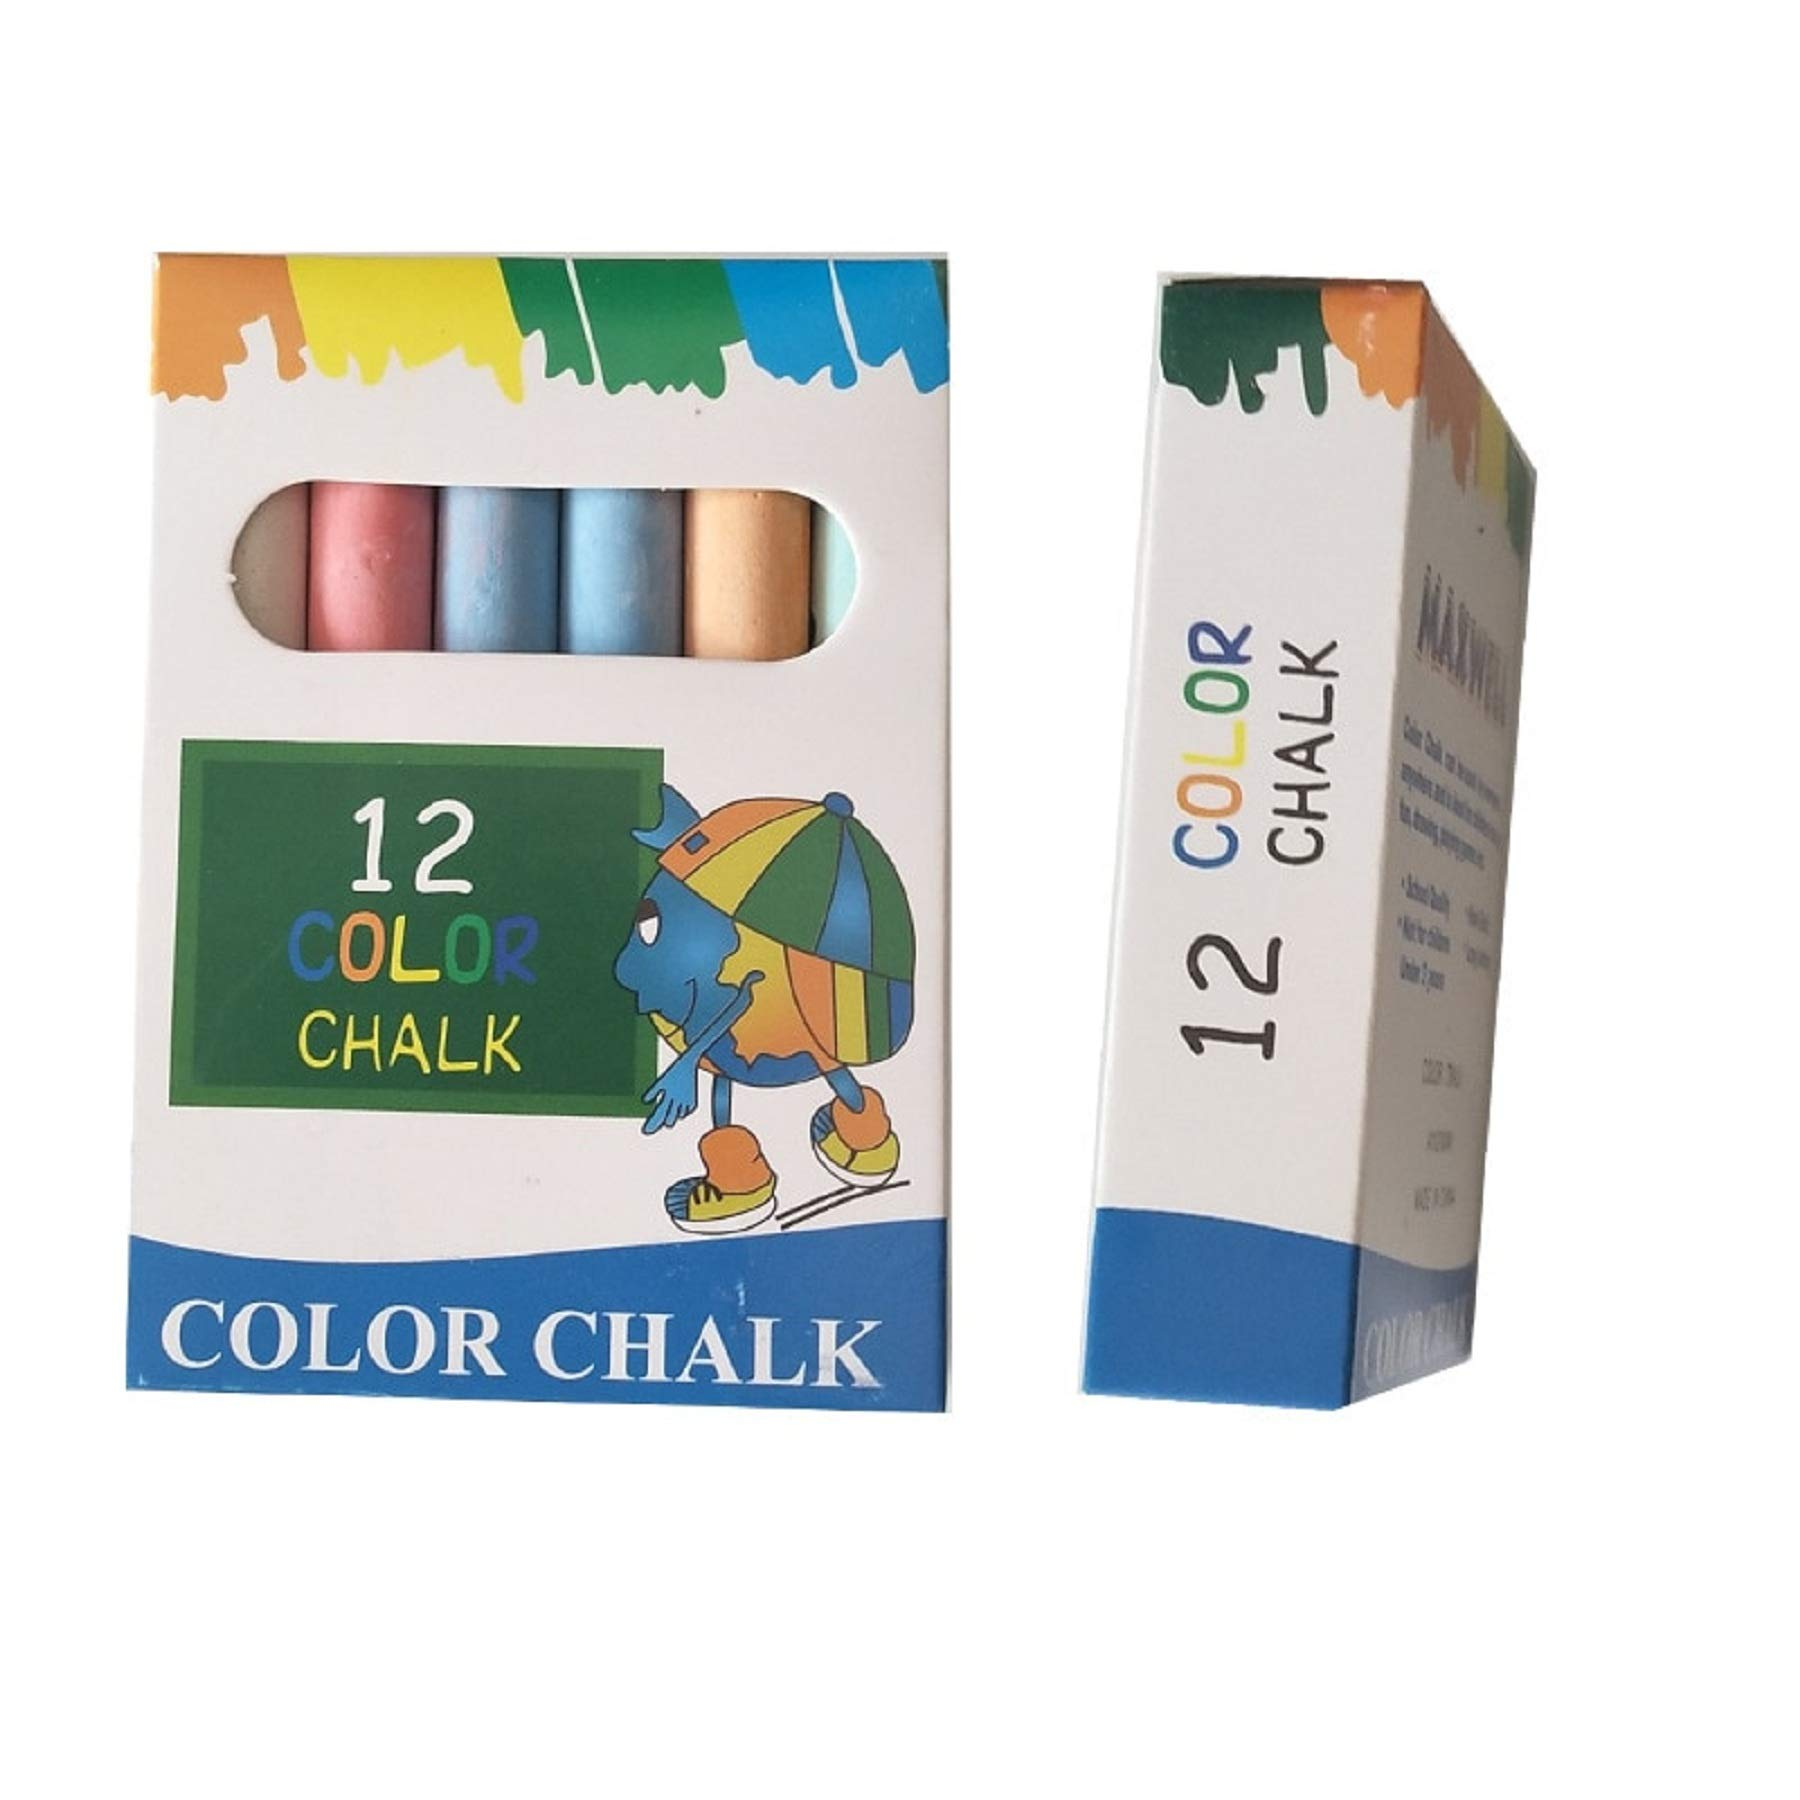 12 pcs/Lot Dustless Chalk Pen Drawing Chalks For Blackboard 6 Colors Stationary Office School Supplies Accessories Tizas Escolar 19E2